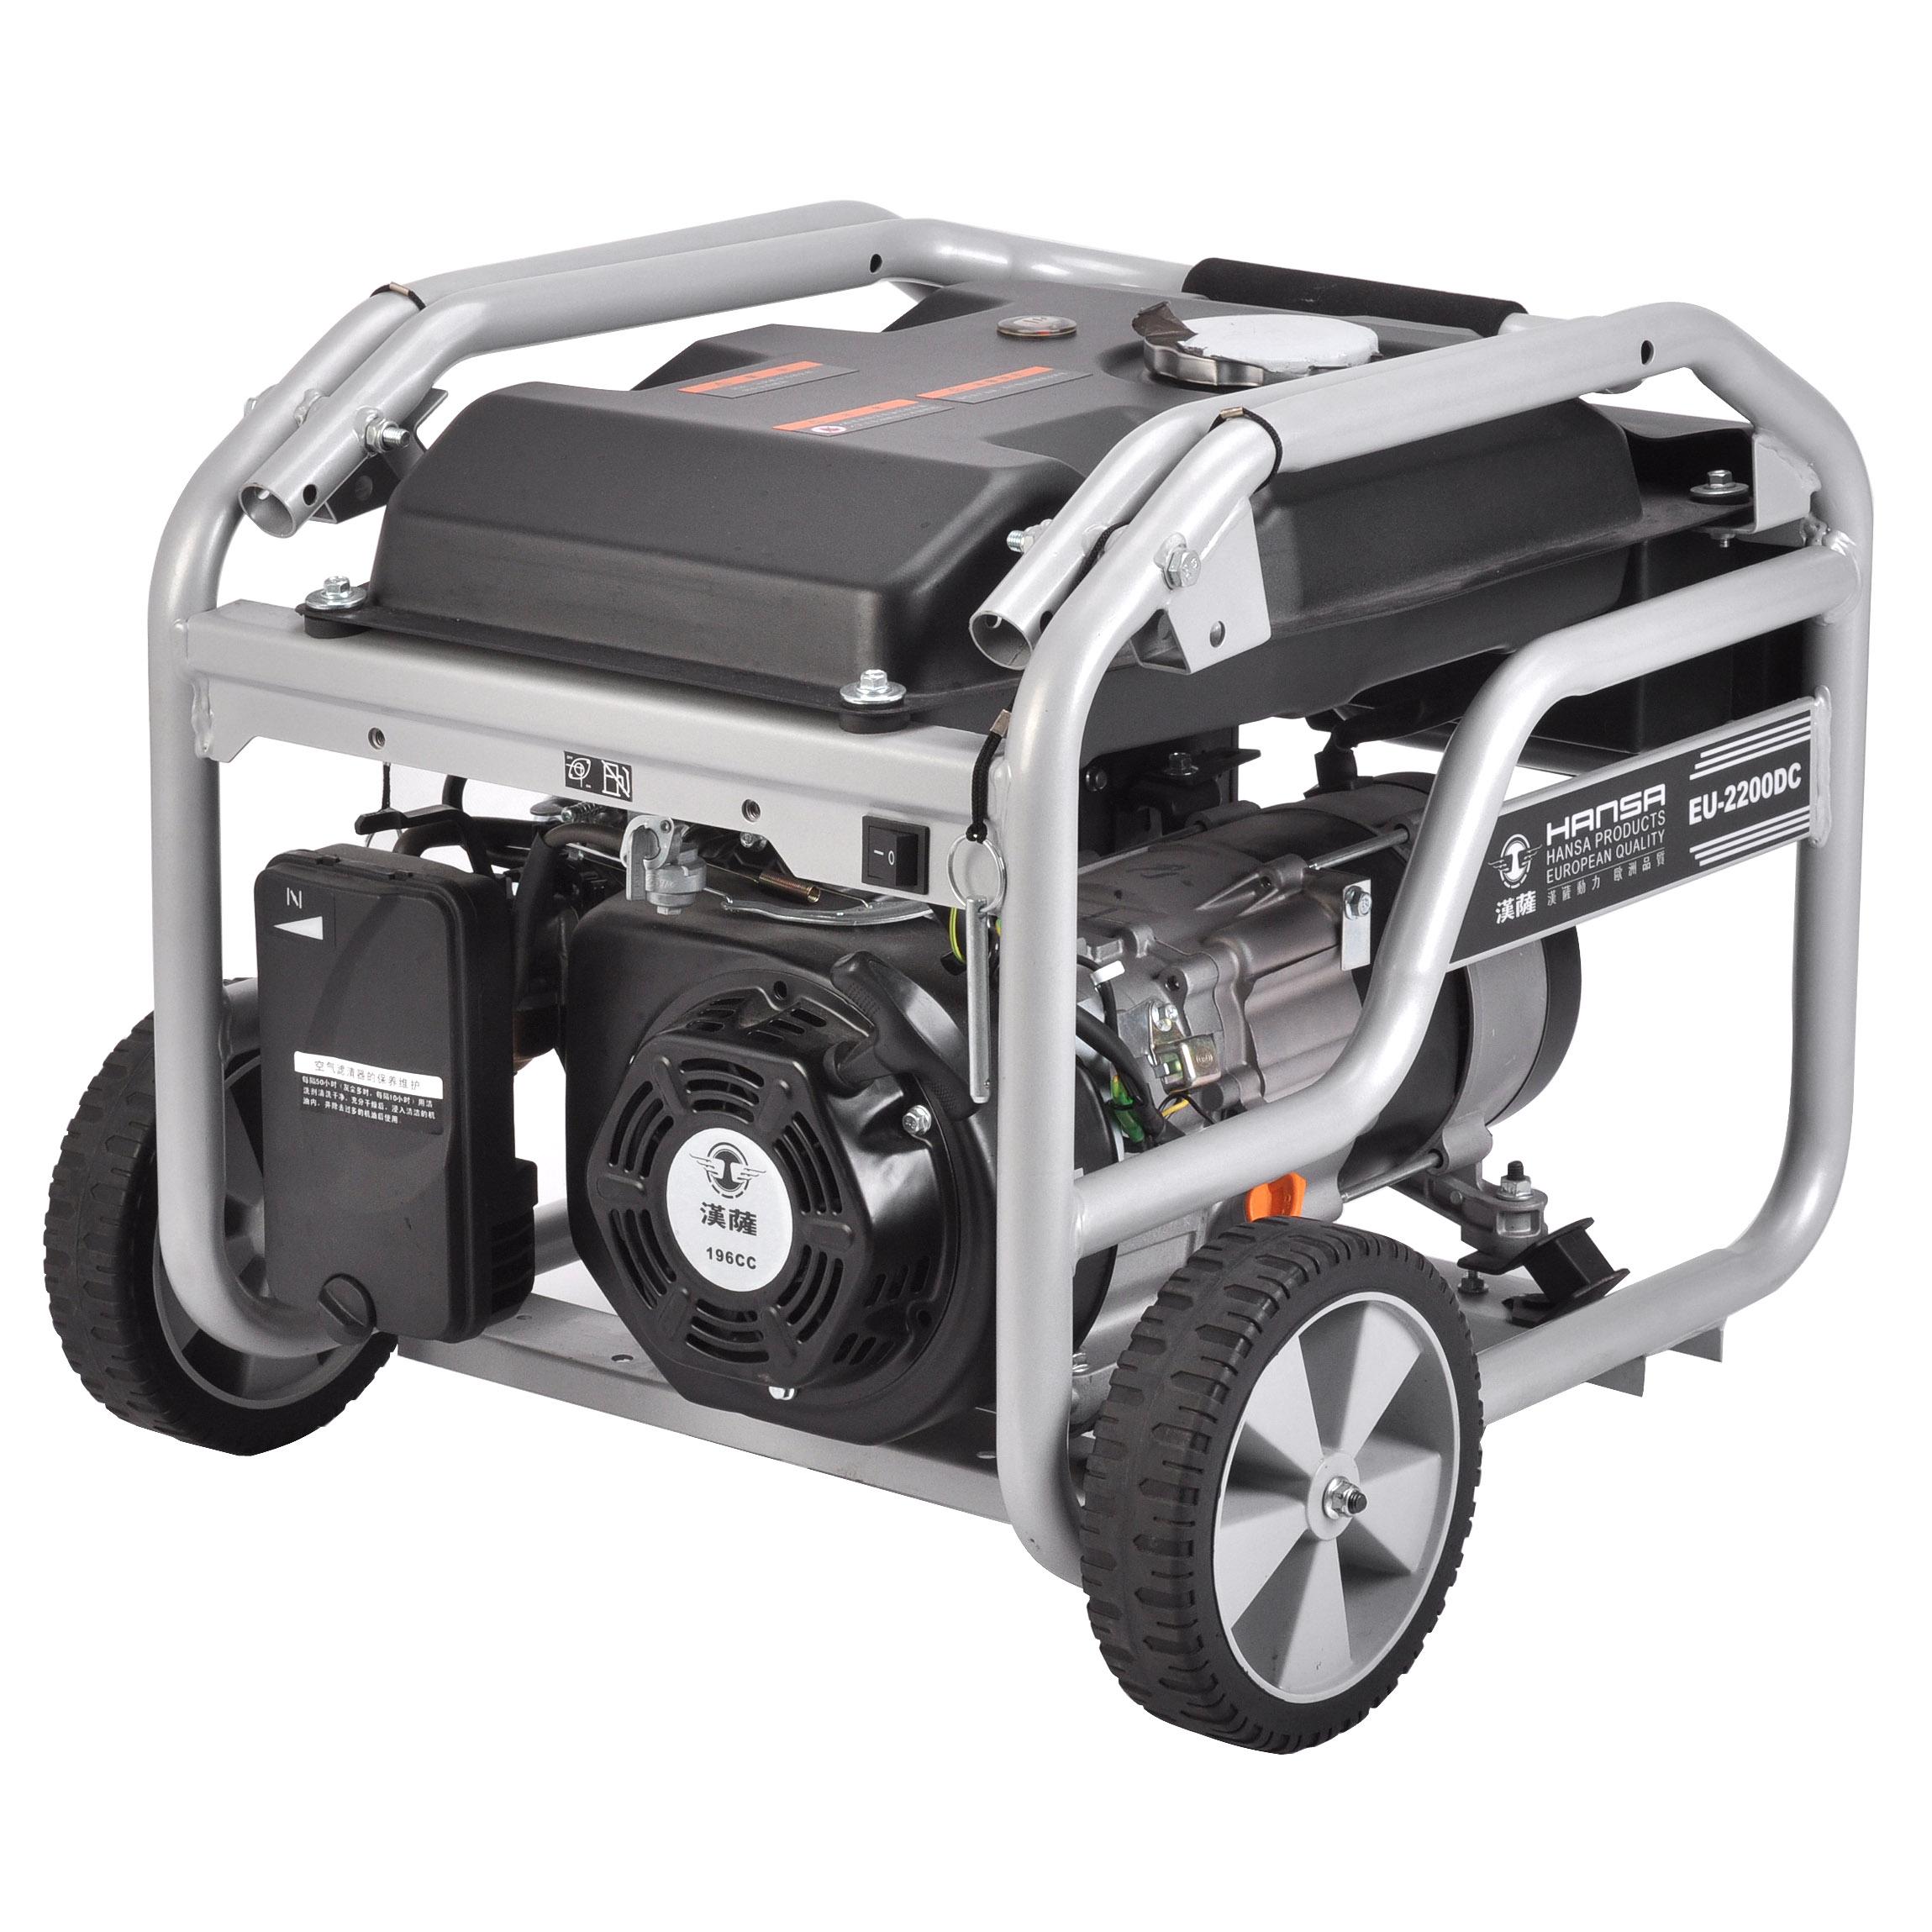 2KW汽油发电机//单相汽油发电机//便携式发电机